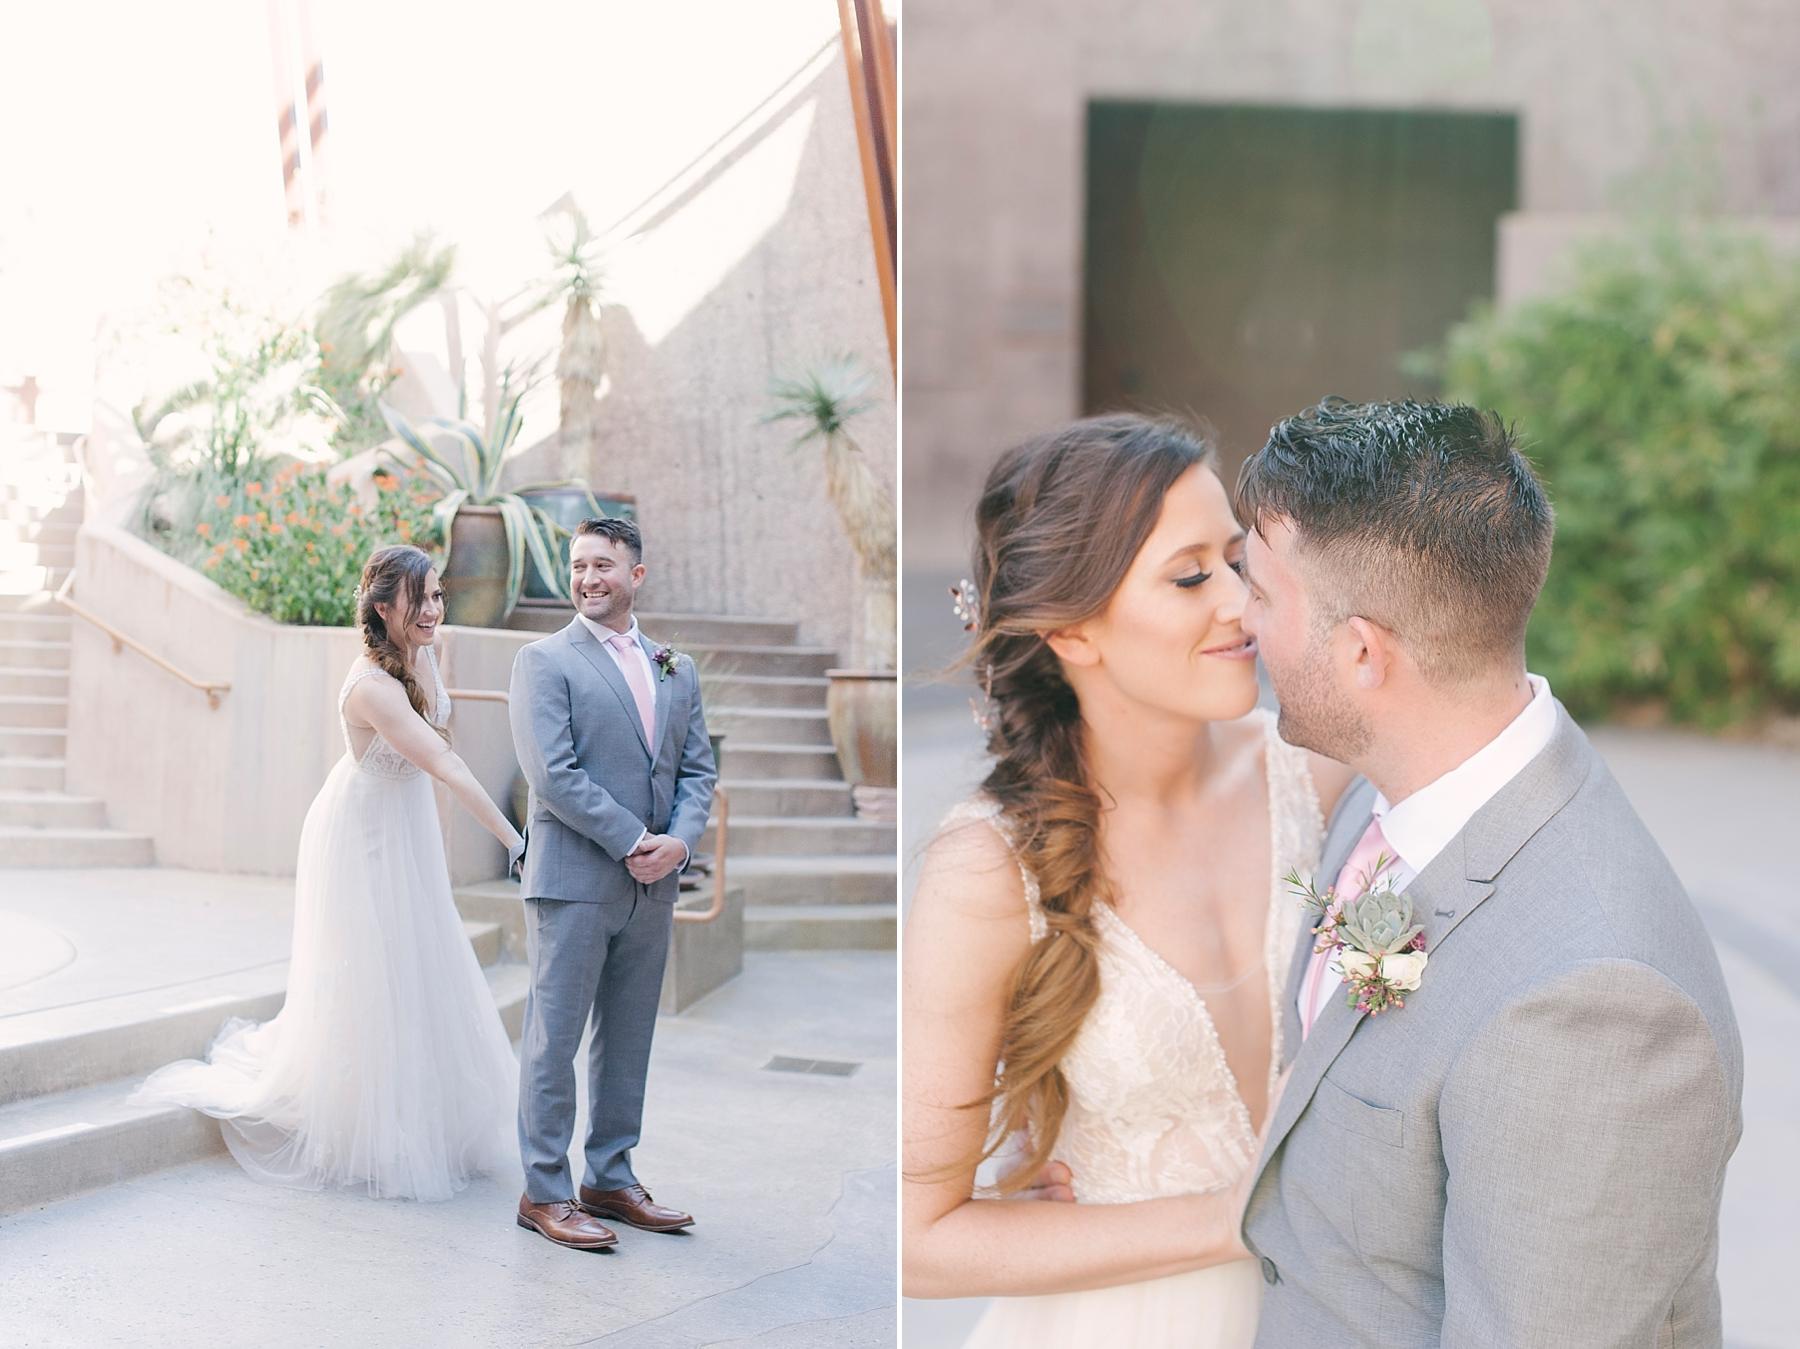 springs-preserve-wedding-las-vegas-destination-photography-the-emerics-14.jpg